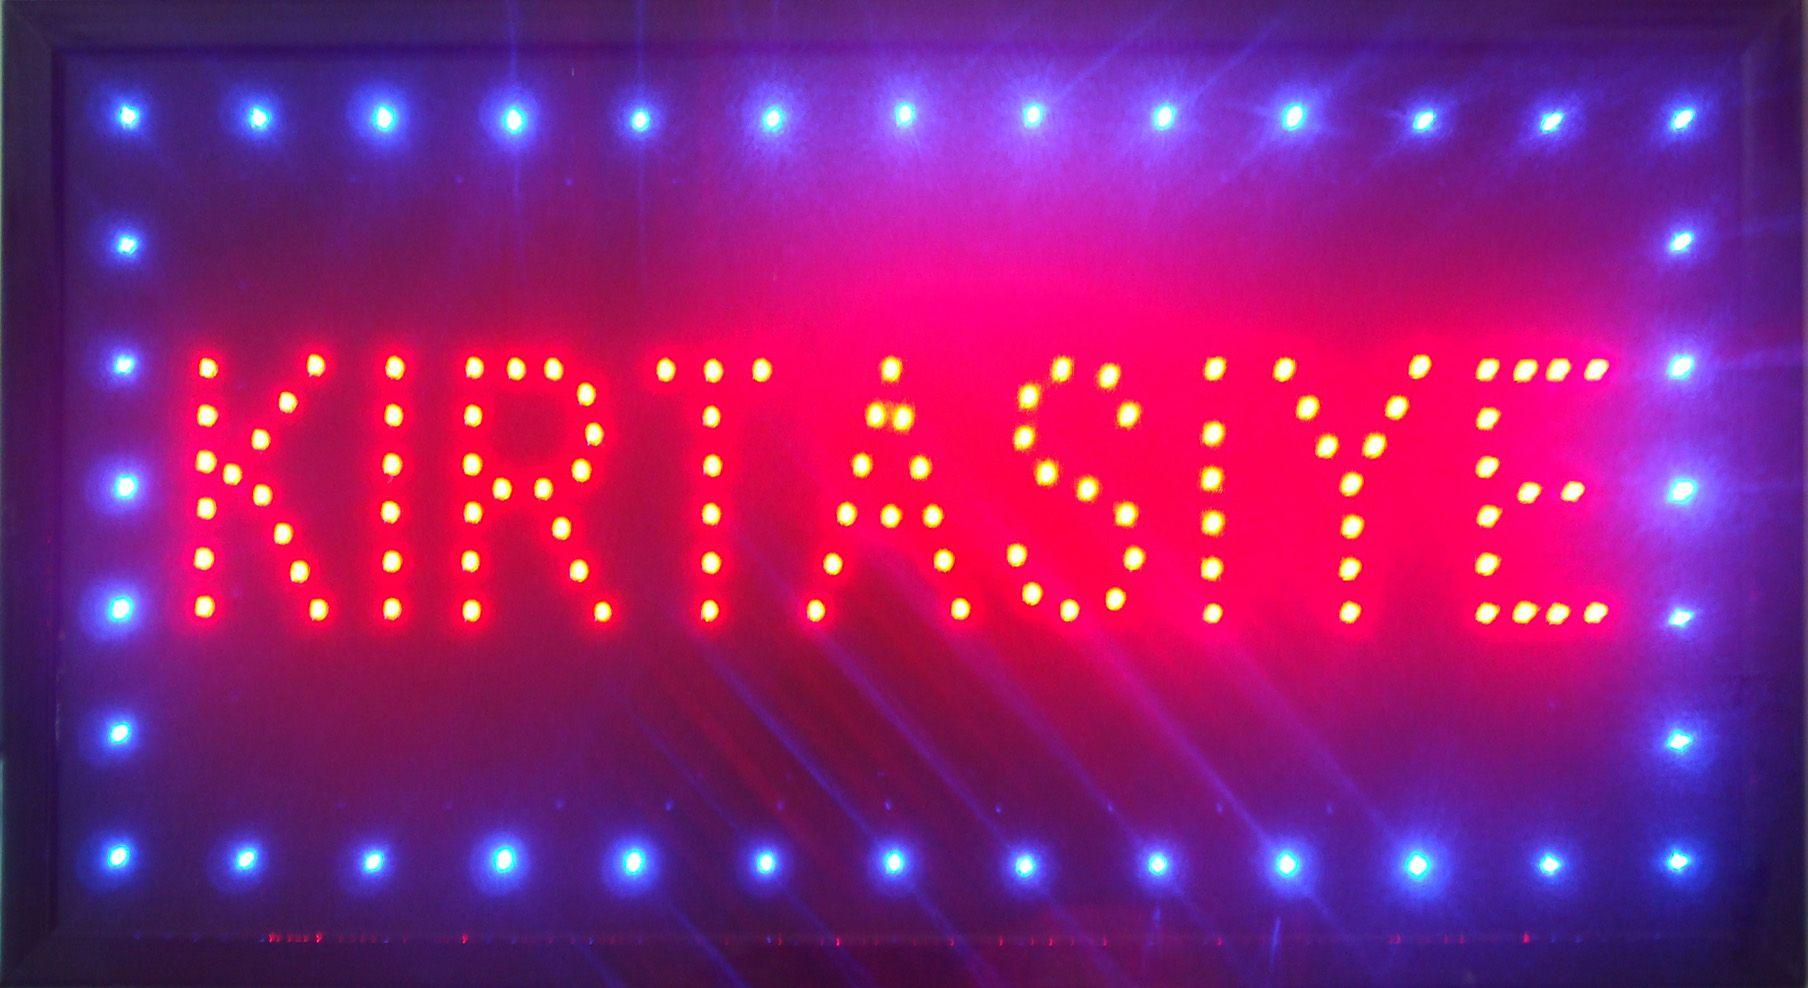 LED Neon Sign KIRTASIYE Animated Neon Eye-catching Slogans Billboard ...